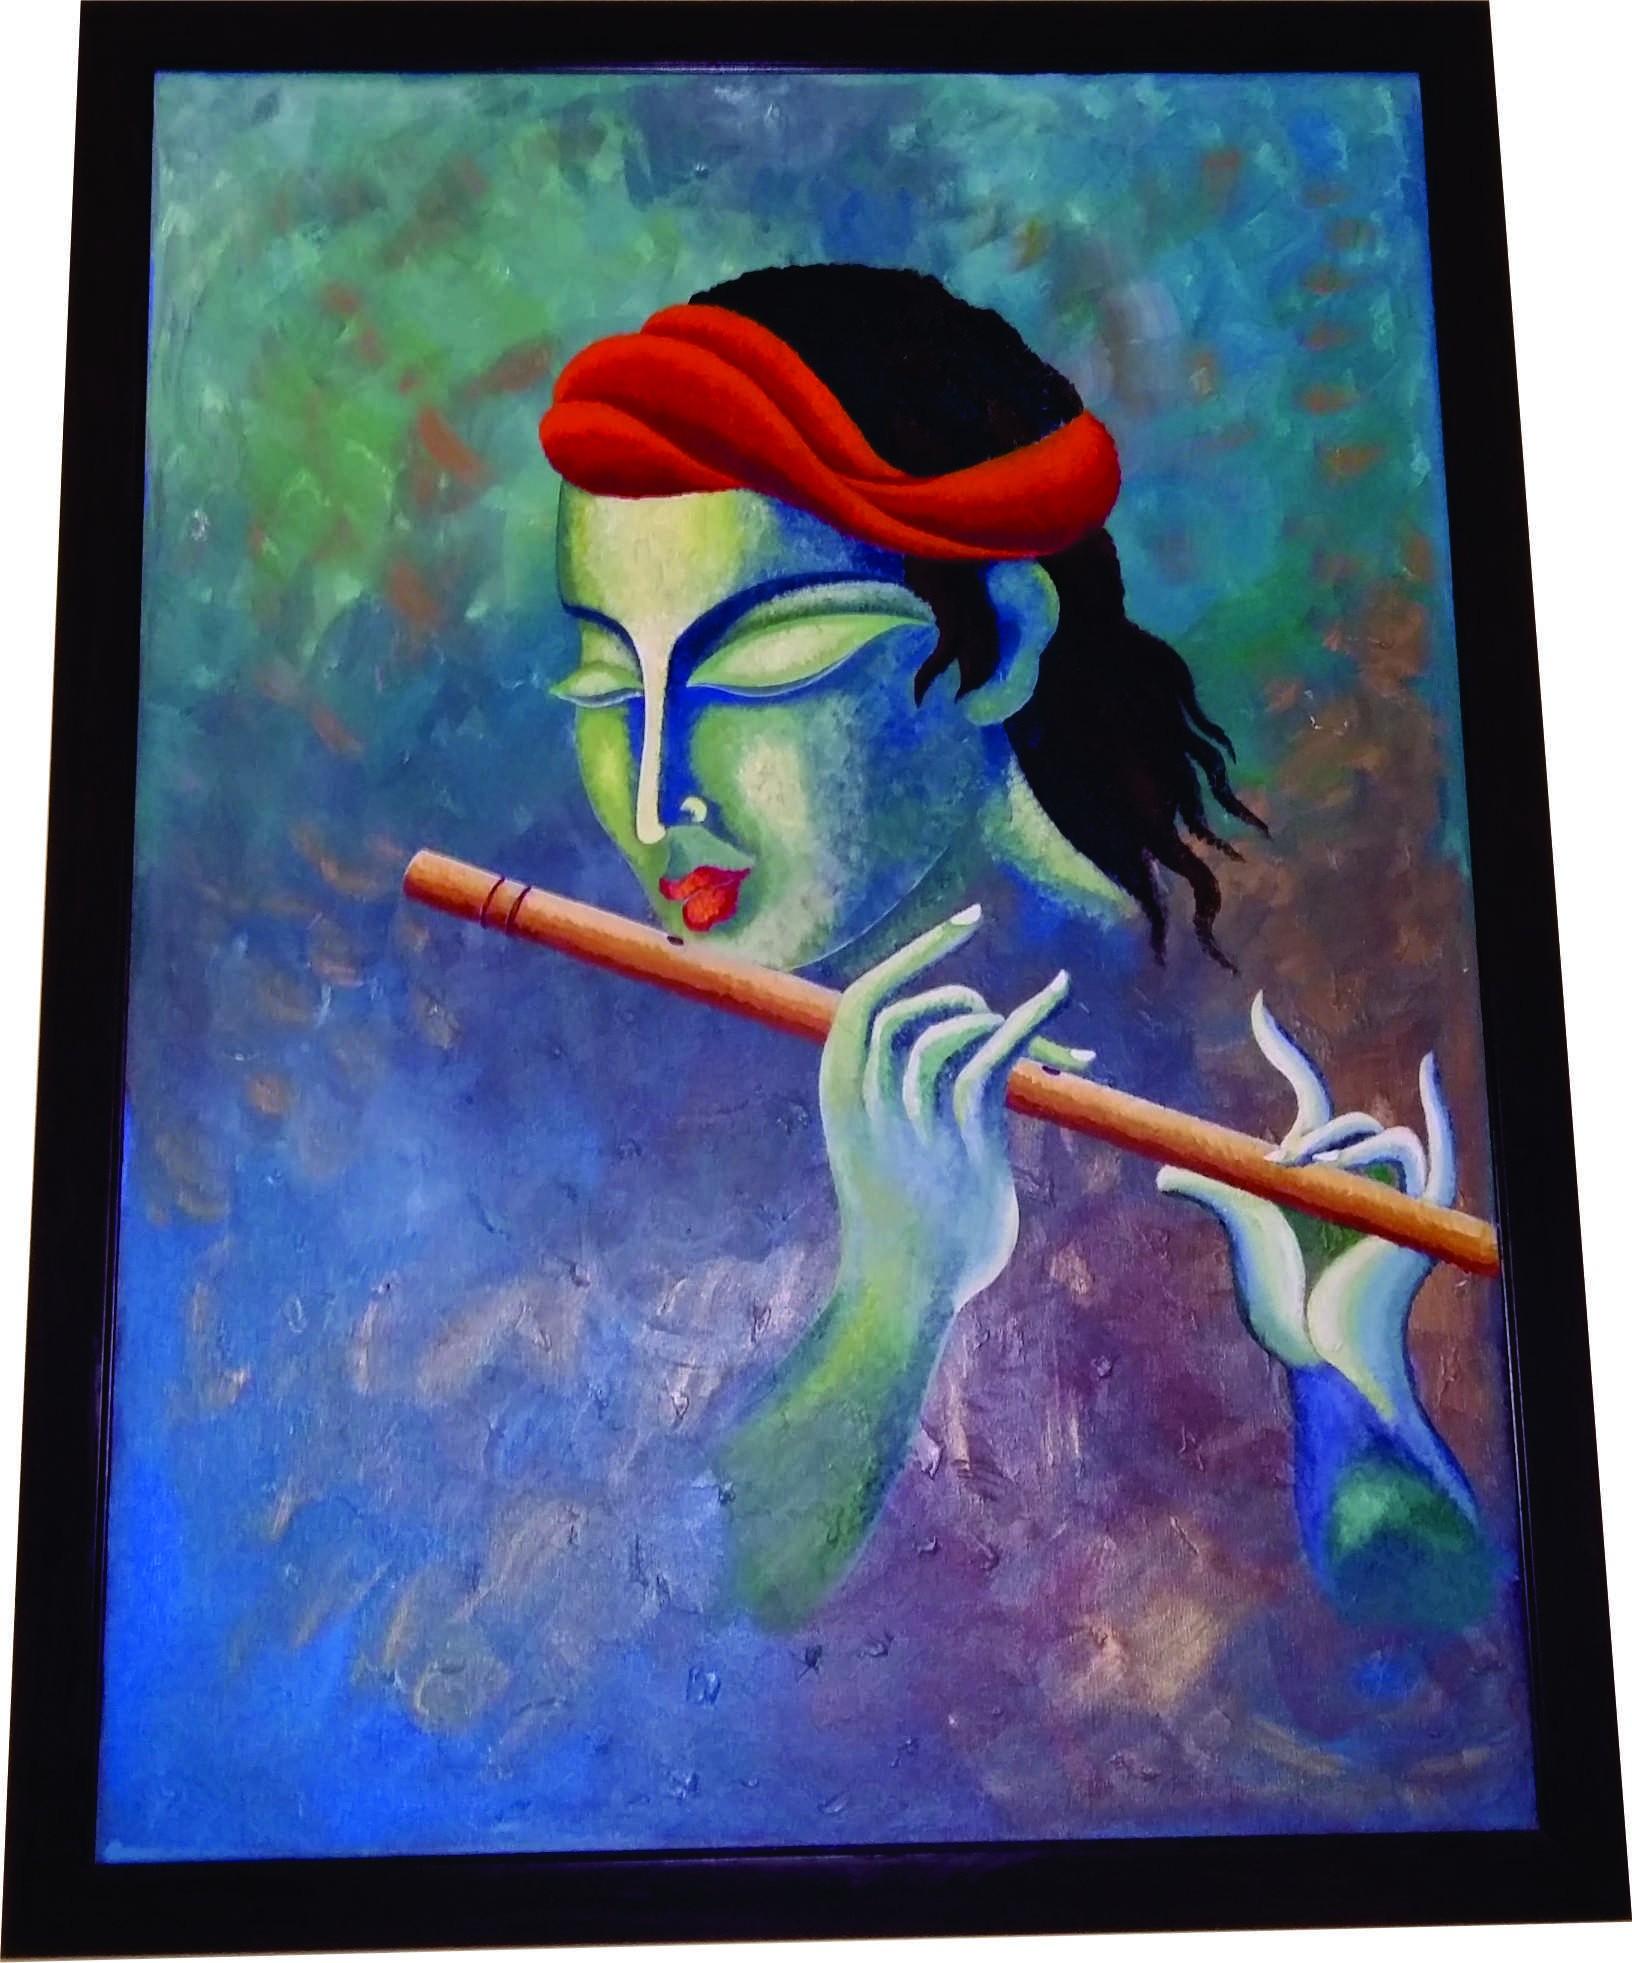 buy lord krishna hand painted art  krishna modern art  bonghaatcom - lord krishna hand painted art